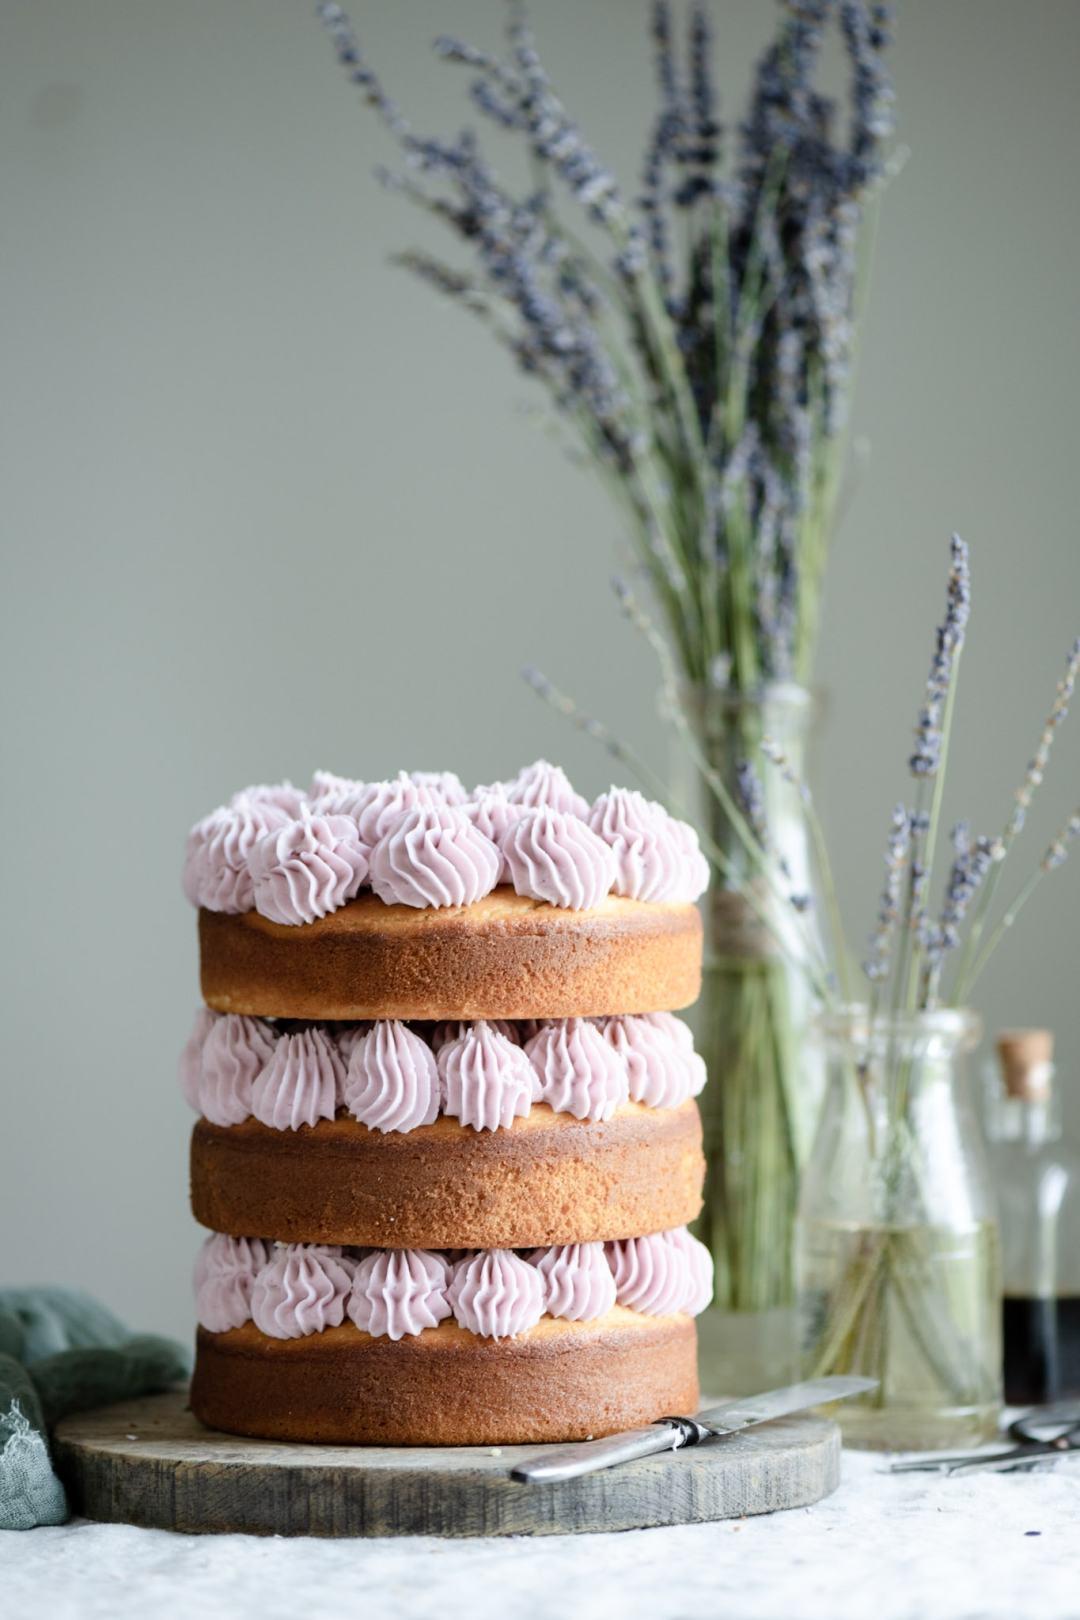 Layered vanilla cake with purple frosting.